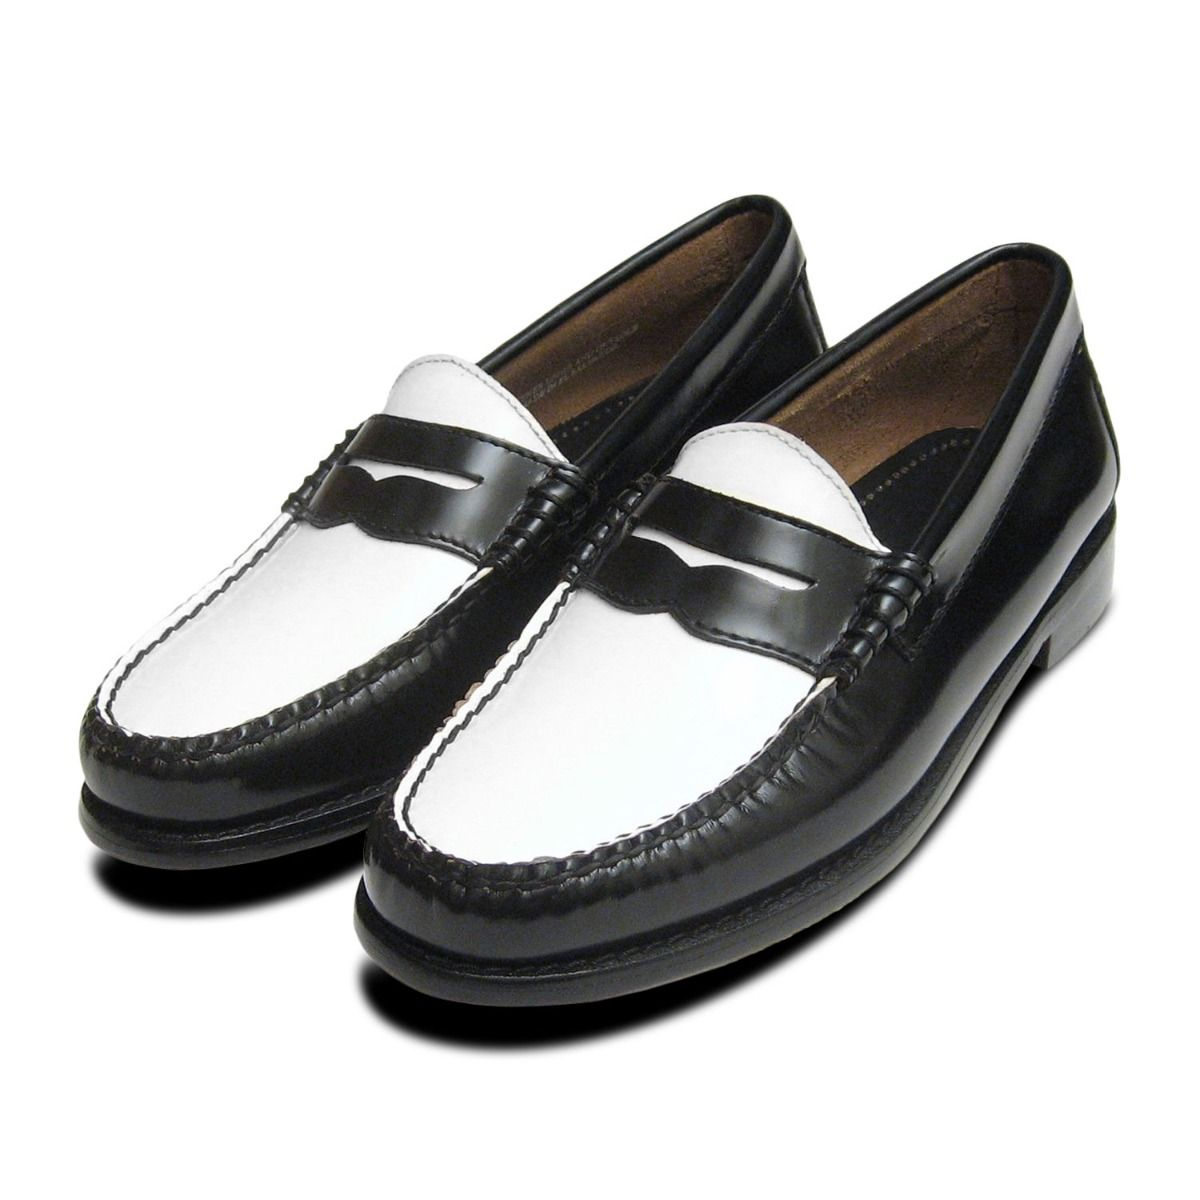 Black \u0026 White Ladies Penny Loafers